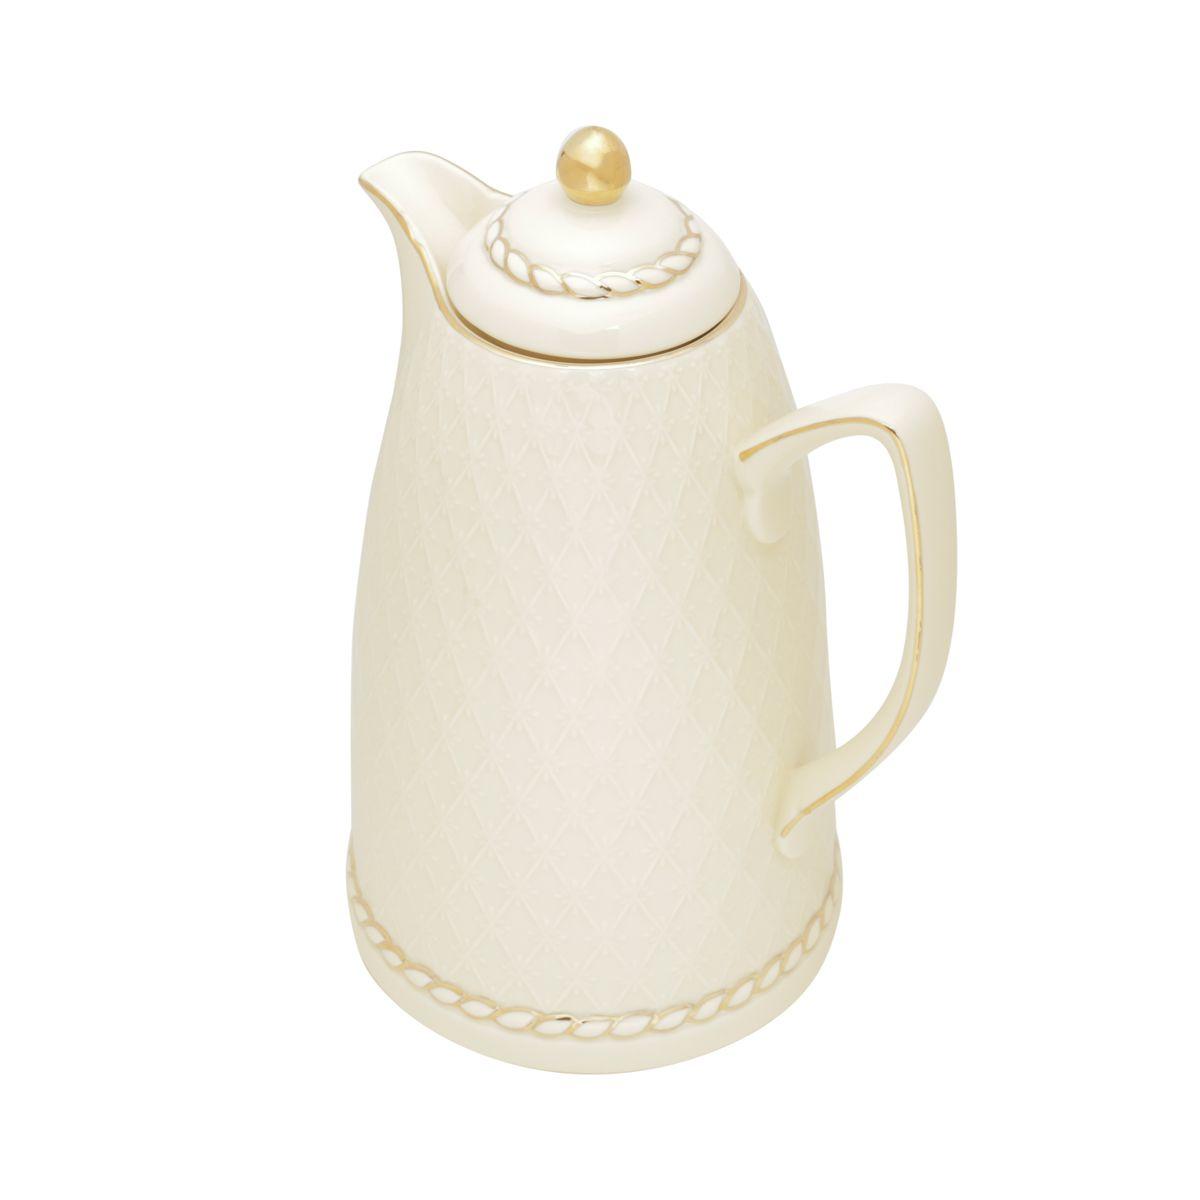 Garrafa Térmica 900ml para café ou chá de porcelana creme Renda Wolff - 35491